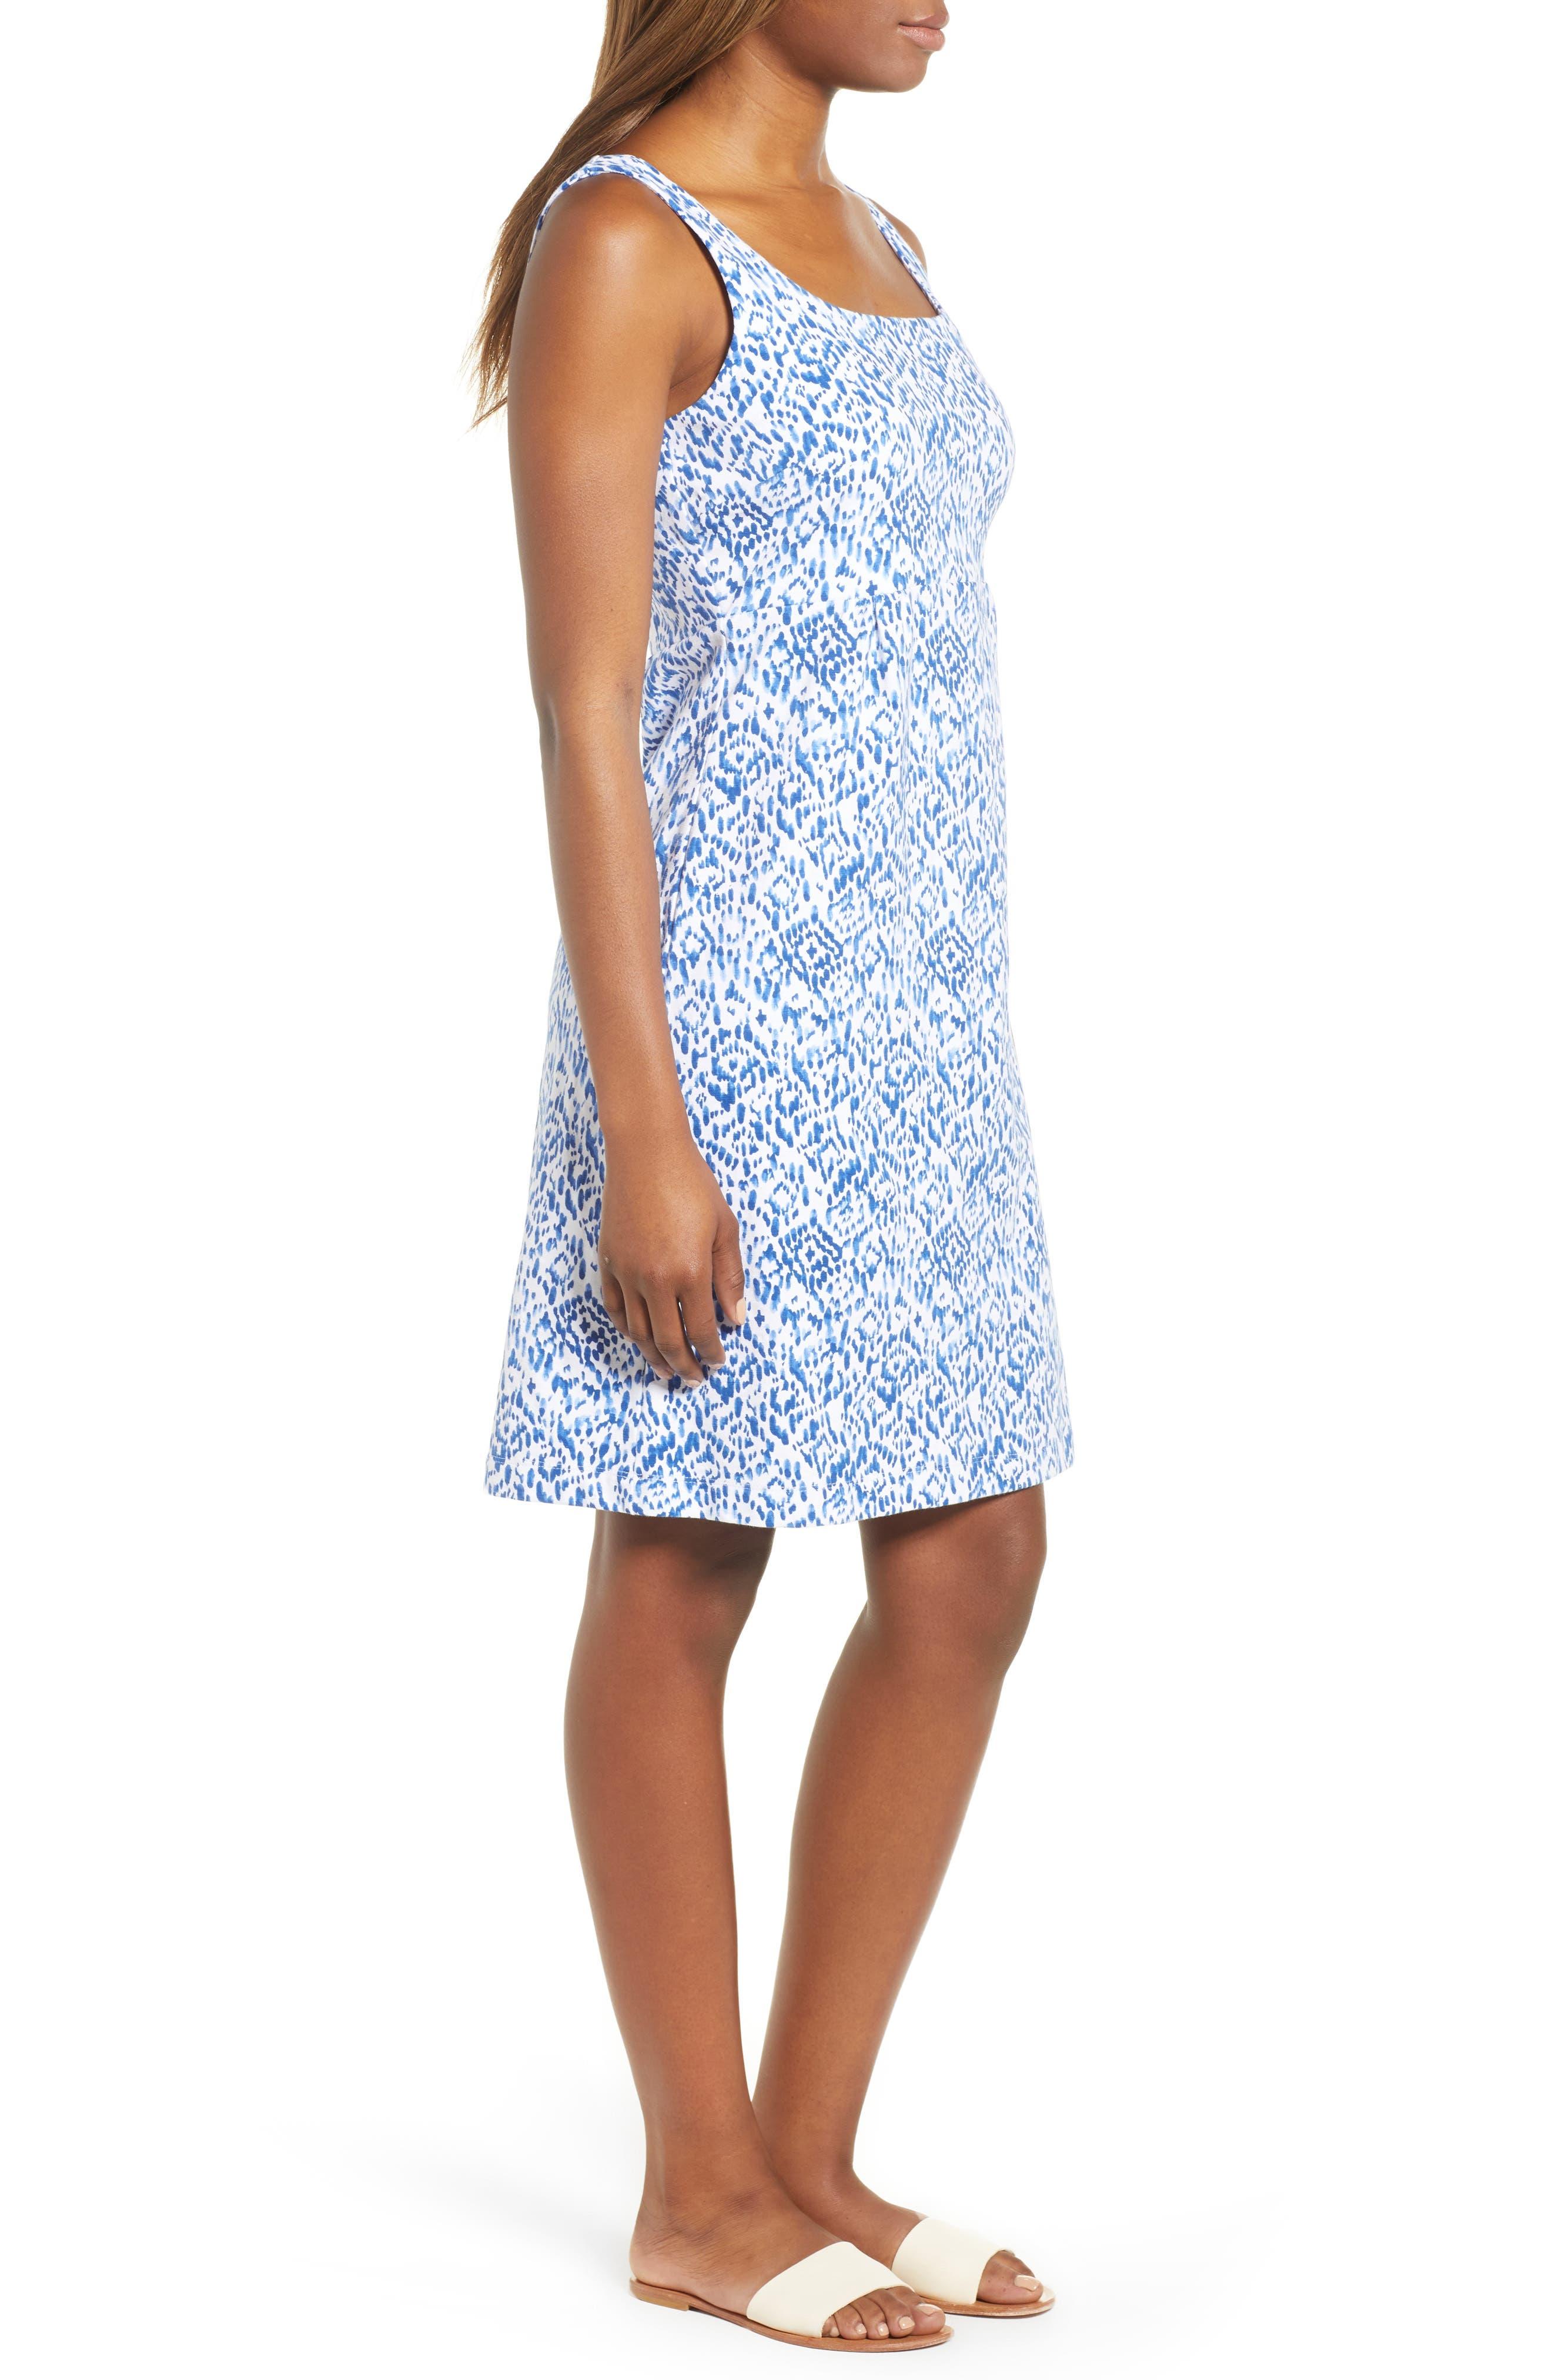 La Liorena Sleeveless Stretch Cotton Tank Dress,                             Alternate thumbnail 3, color,                             400